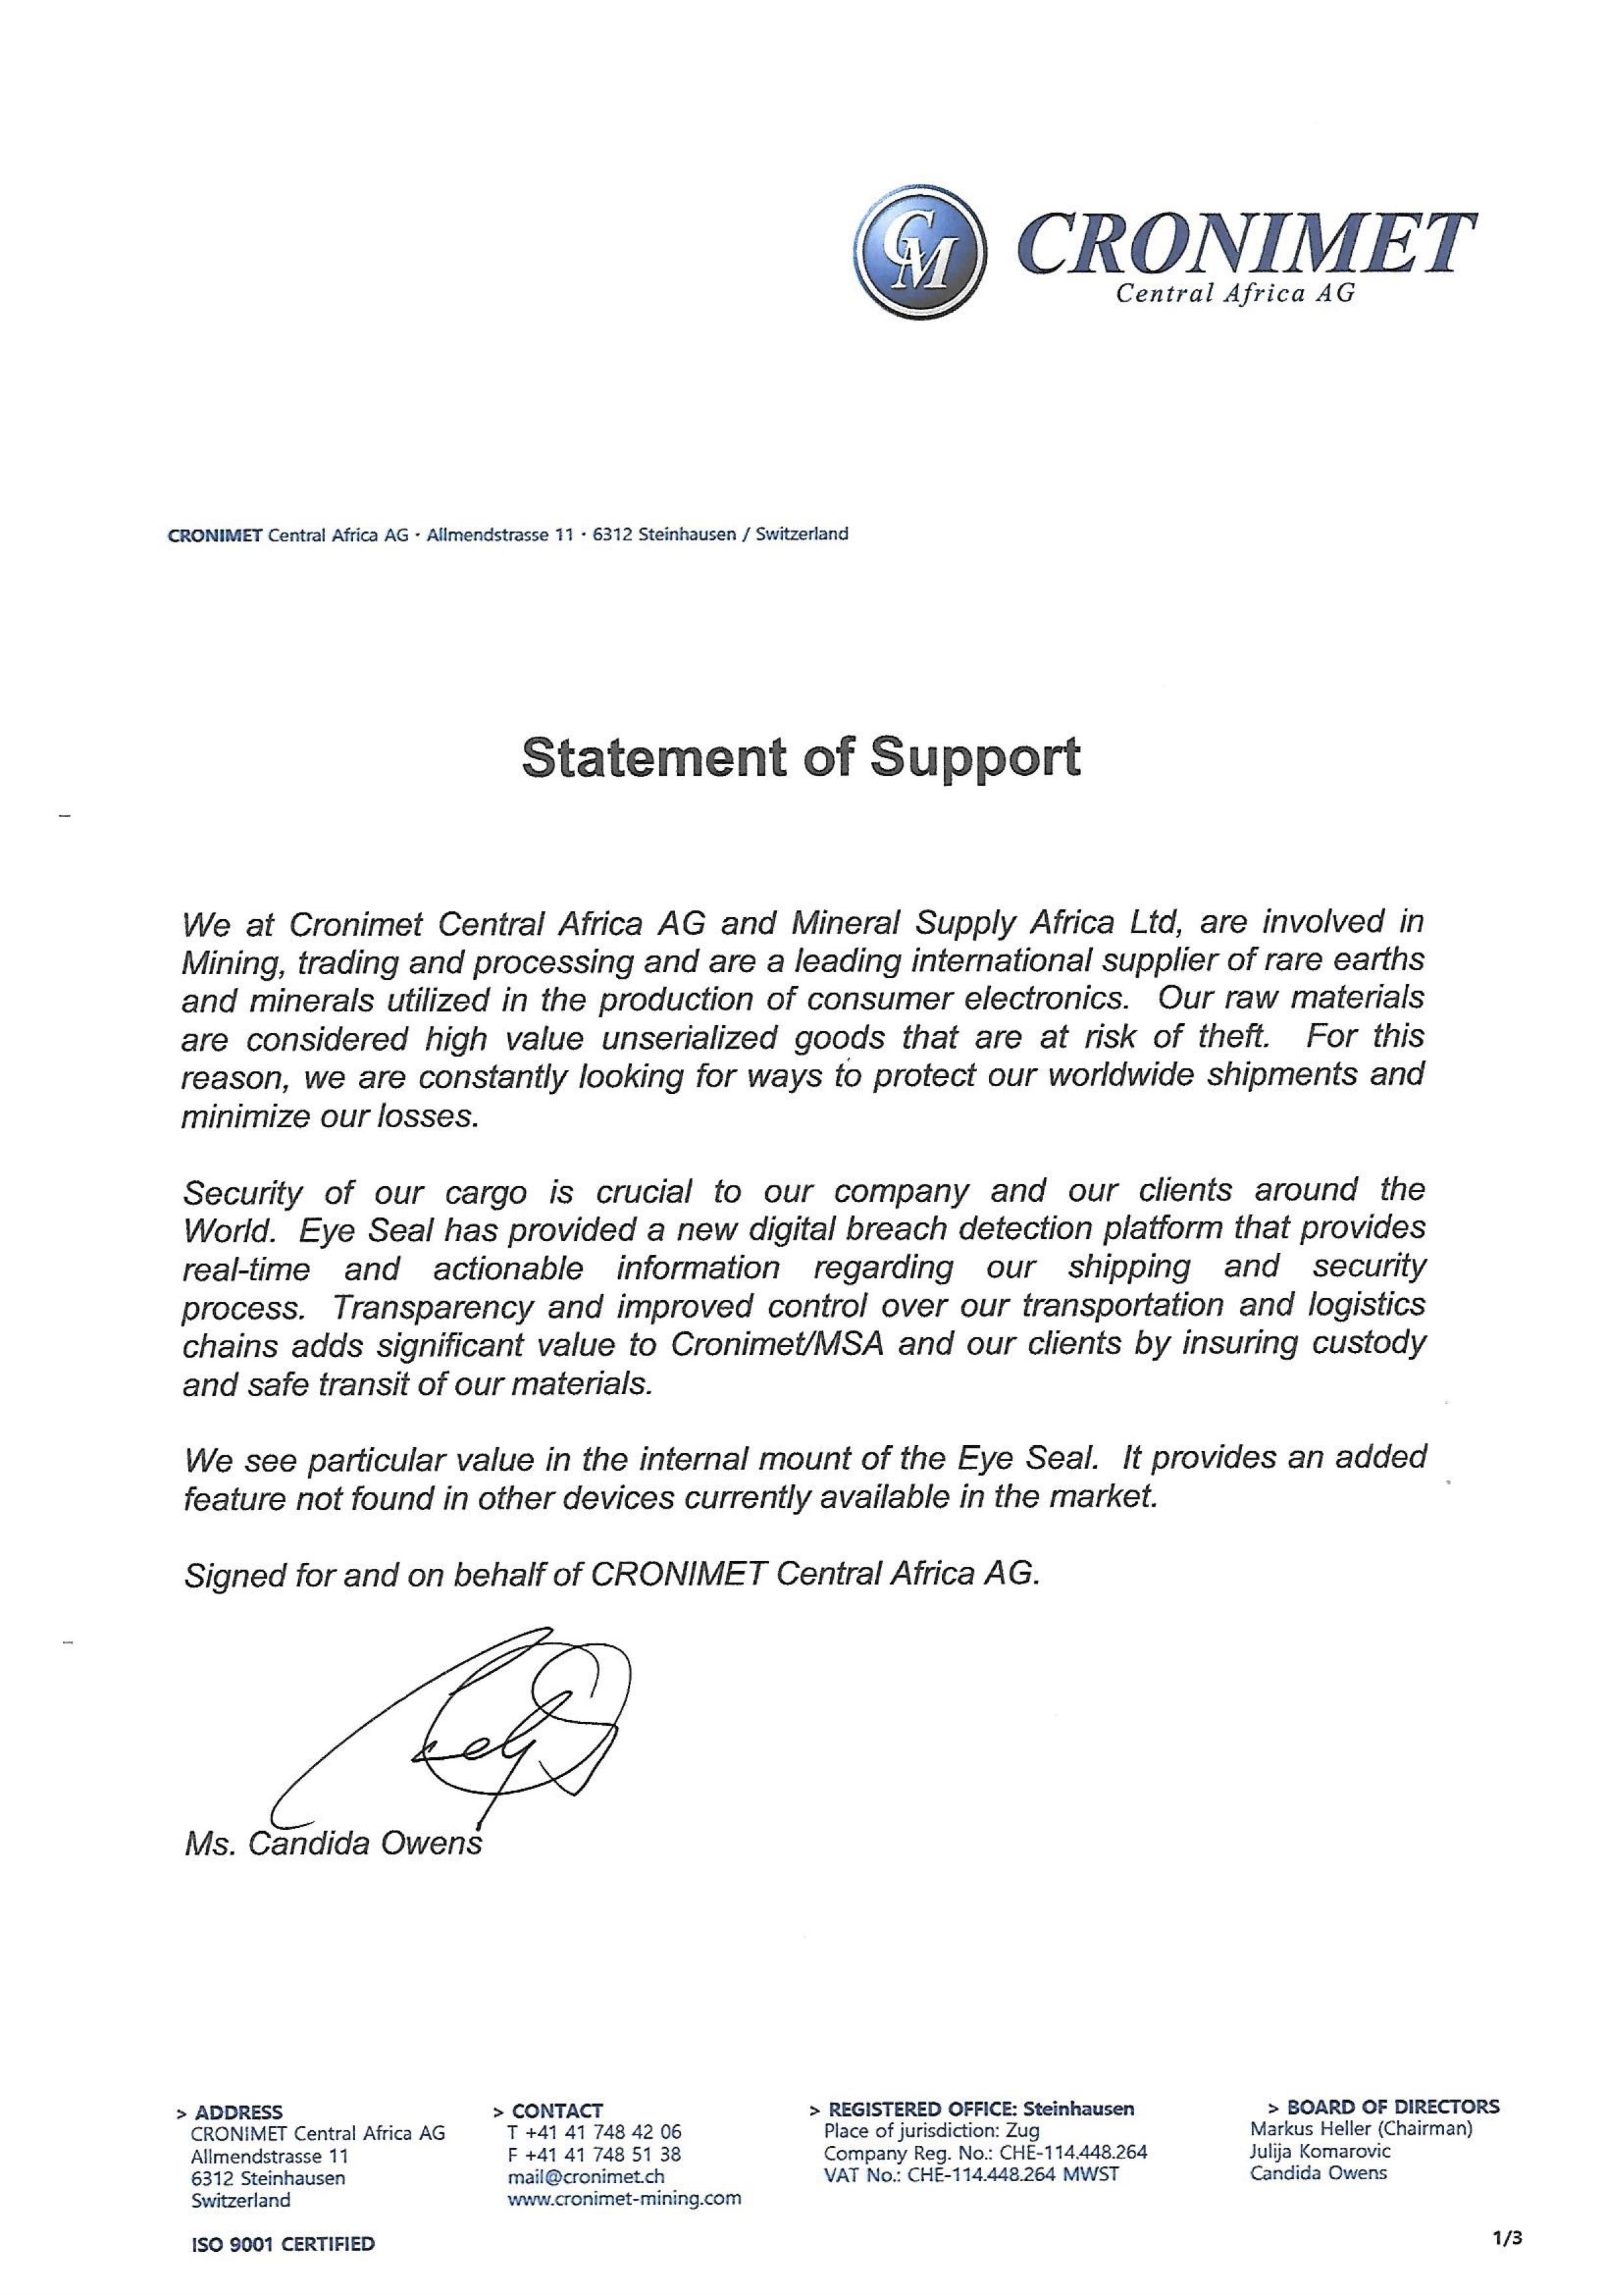 Statement of Support by Cronimet